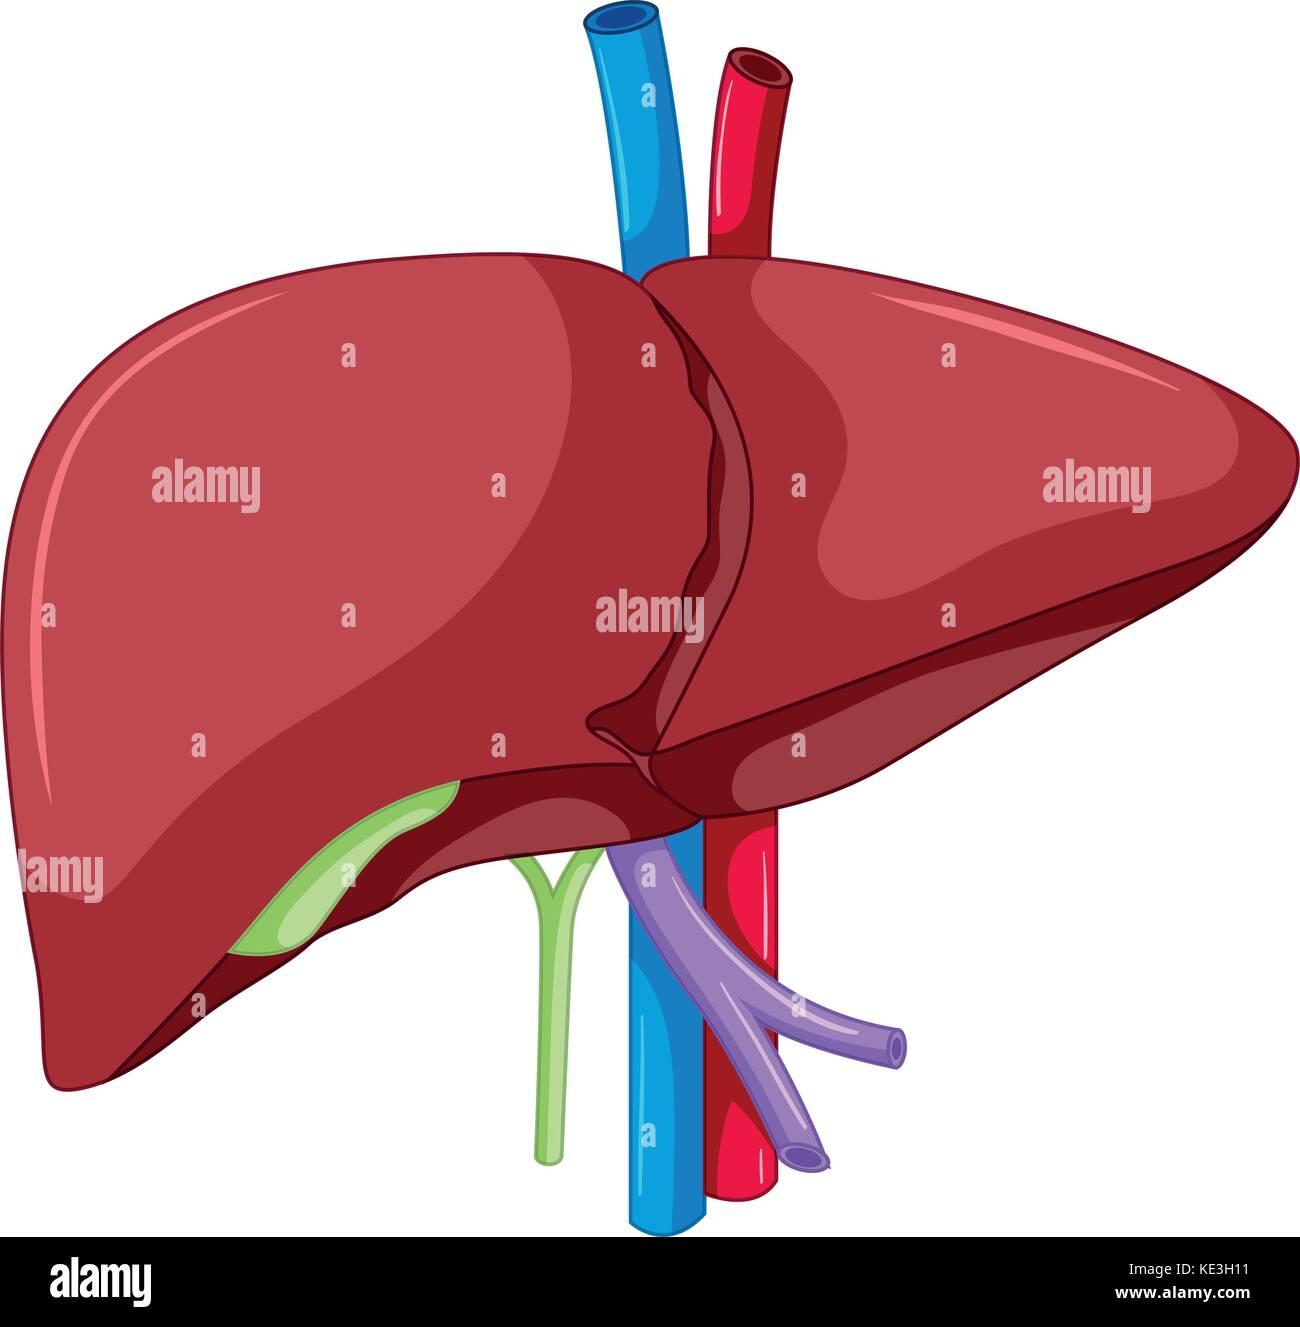 Liver Anatomy Of Human Body Illustration Stock Vector Art